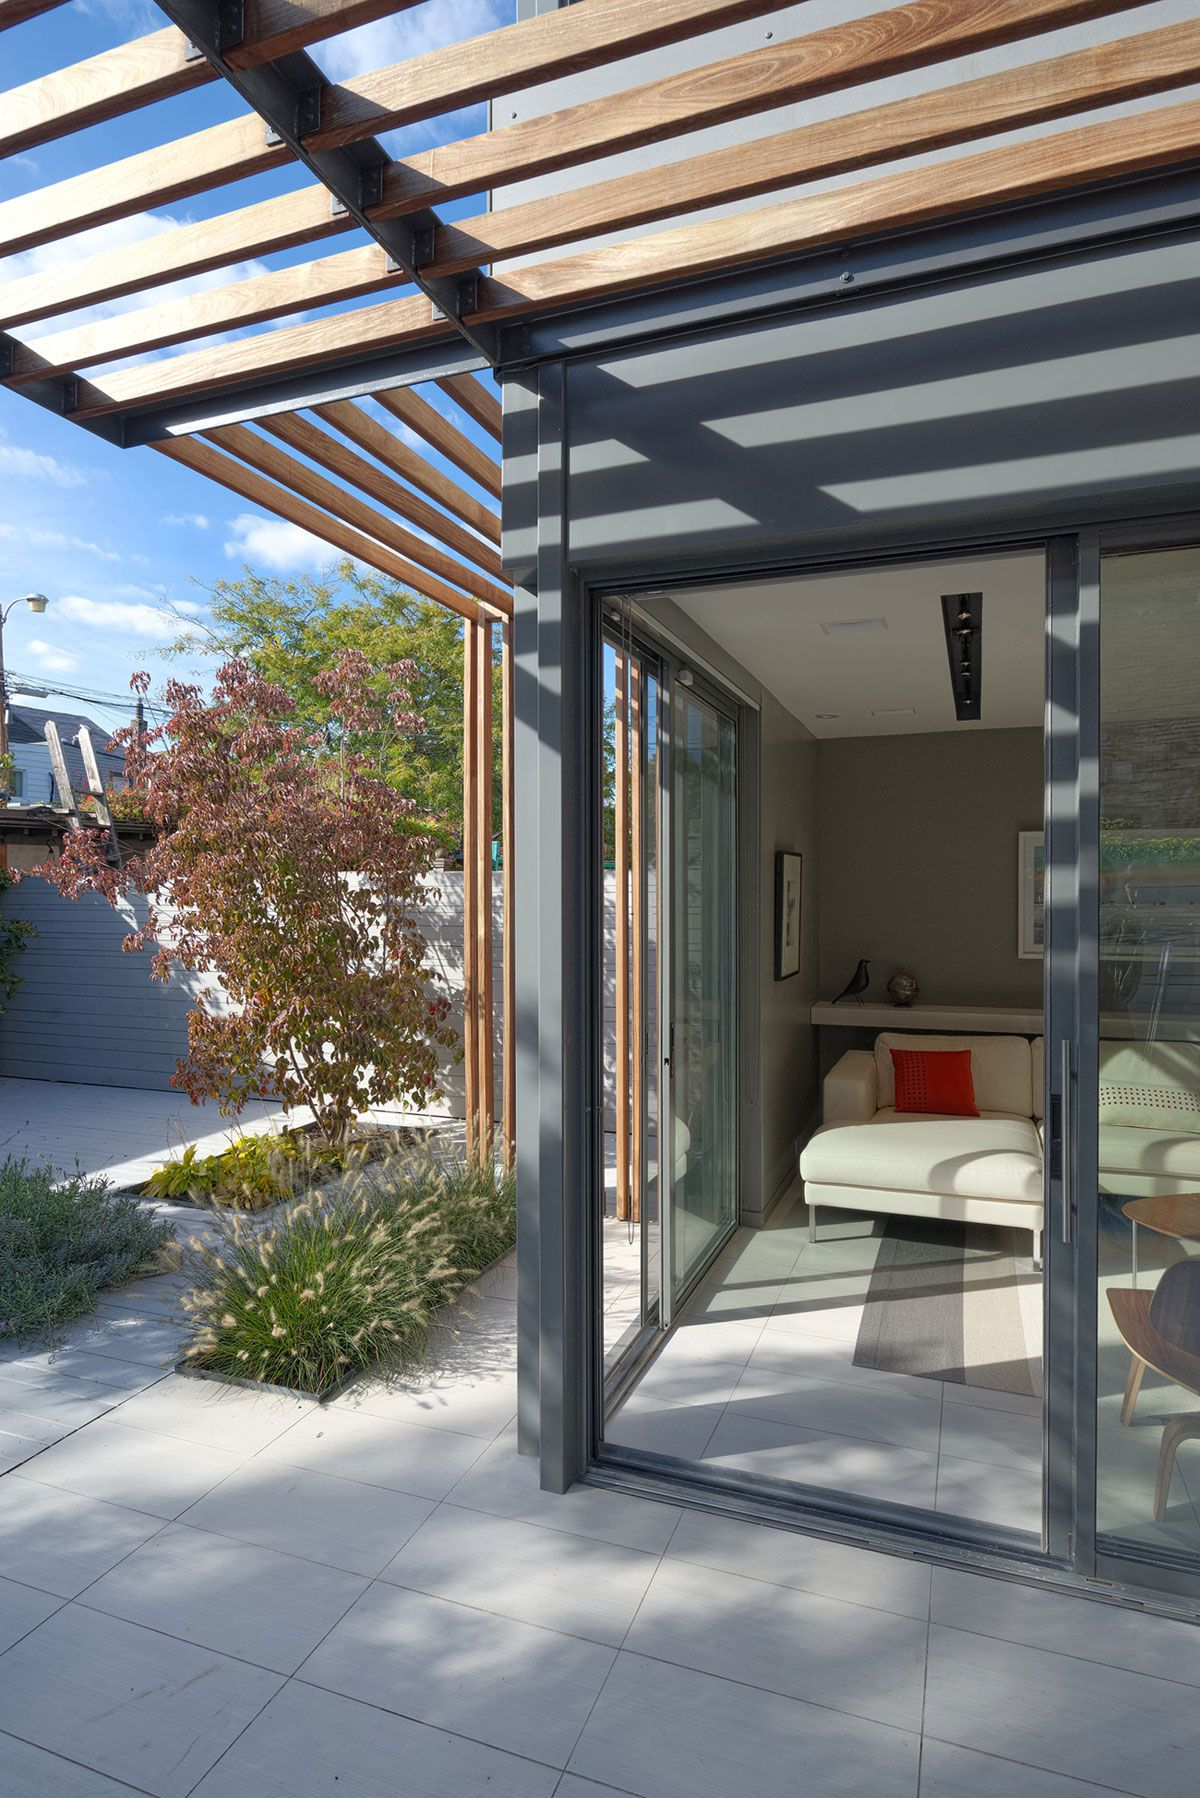 Planos de casa de dos pisos sencilla for Detalles de una casa